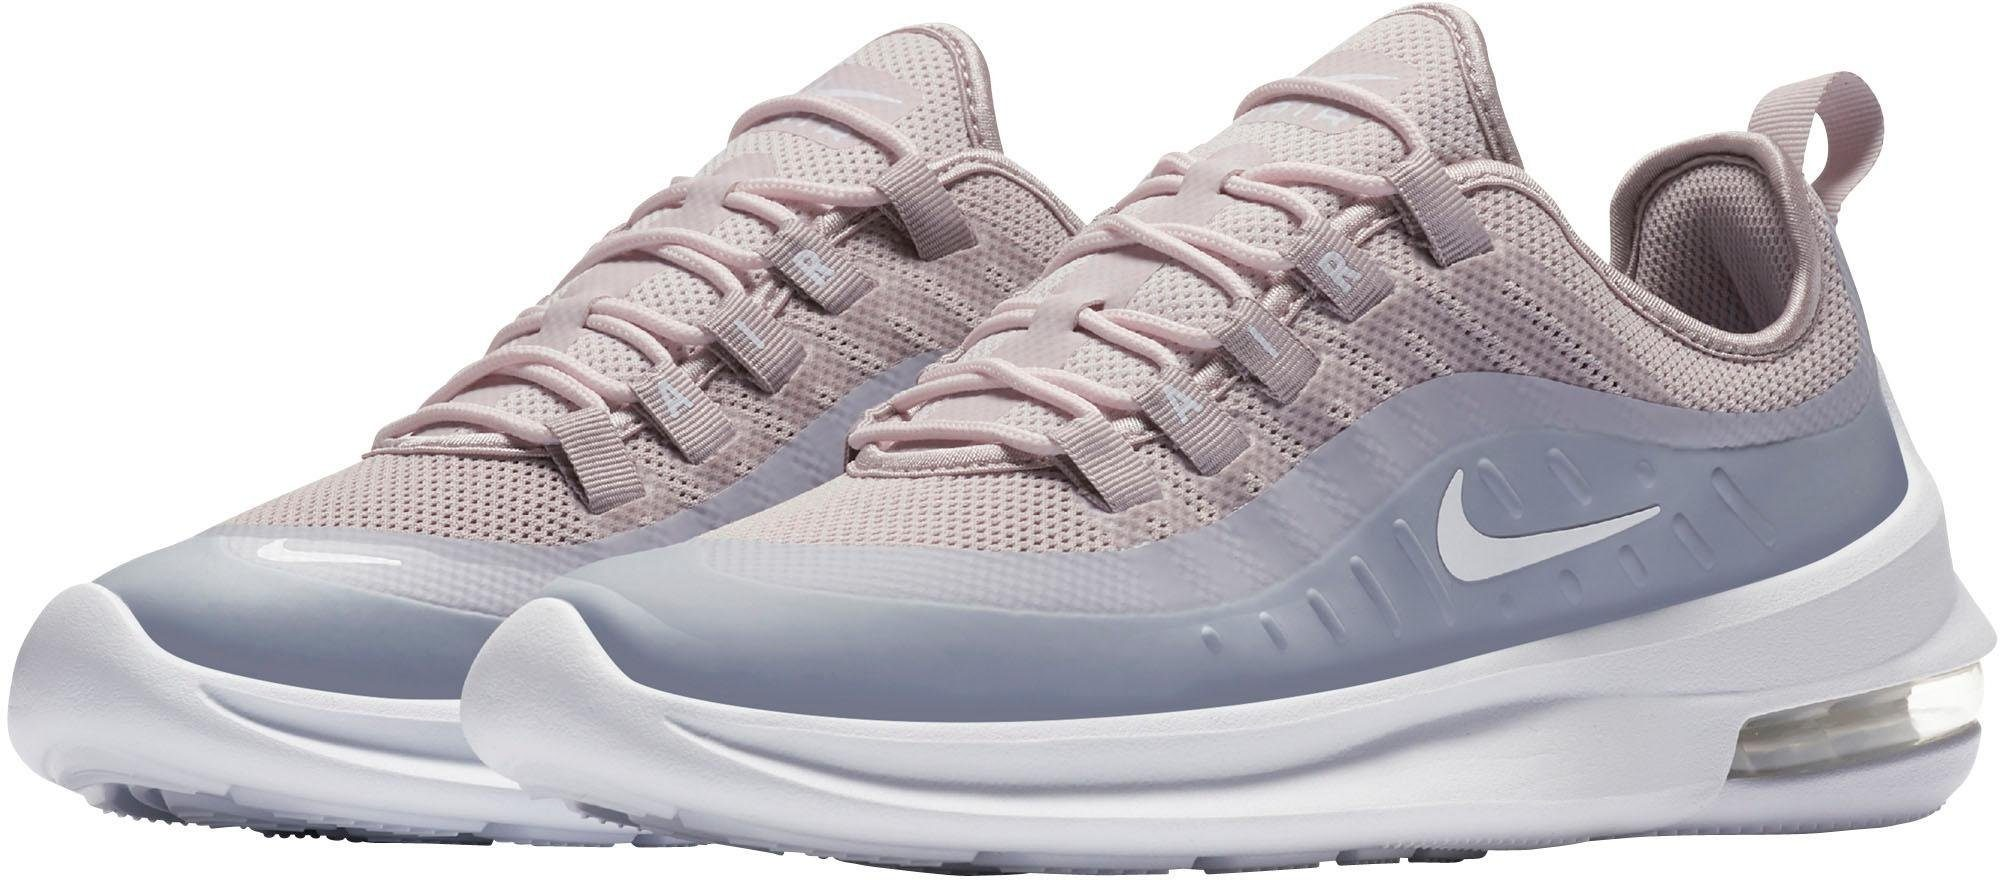 Nike Textil Obermaterial kaufenOTTO Air und online Max »Wmns Sportswear SneakerAtmungsaktives aus Axis« Synthetik c5L3A4jRq